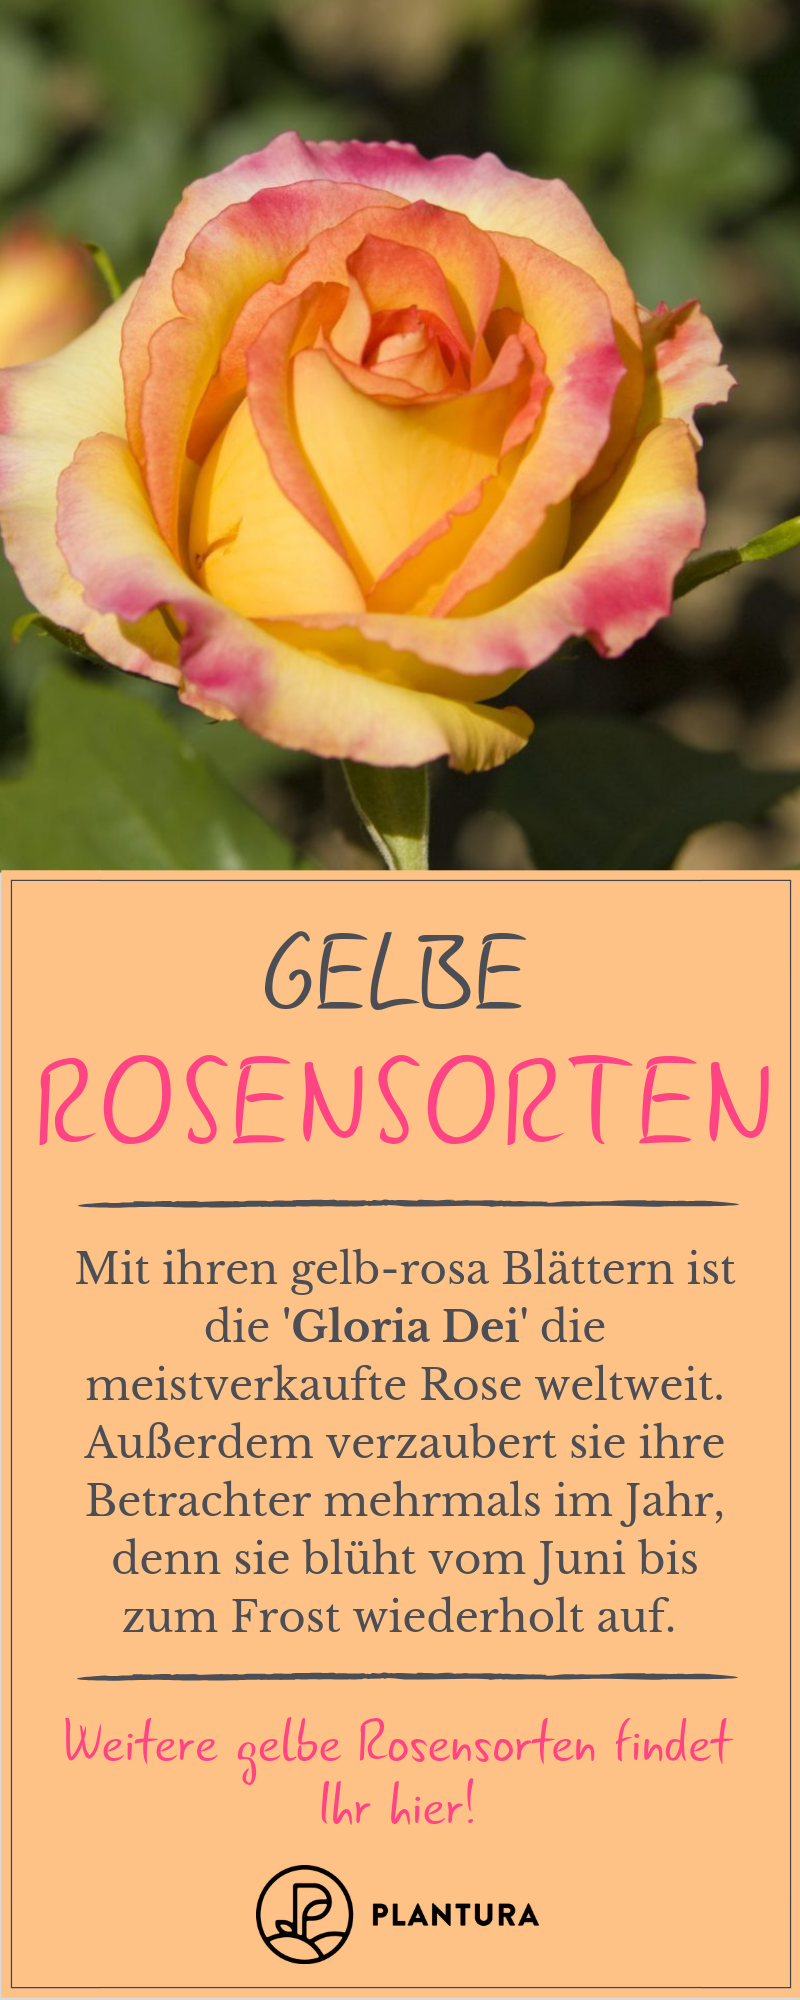 Gelbe Rosen Die 10 Schonsten Sorten Plantura Rosensorten Rosen Pflegen Rosen Pflanzen